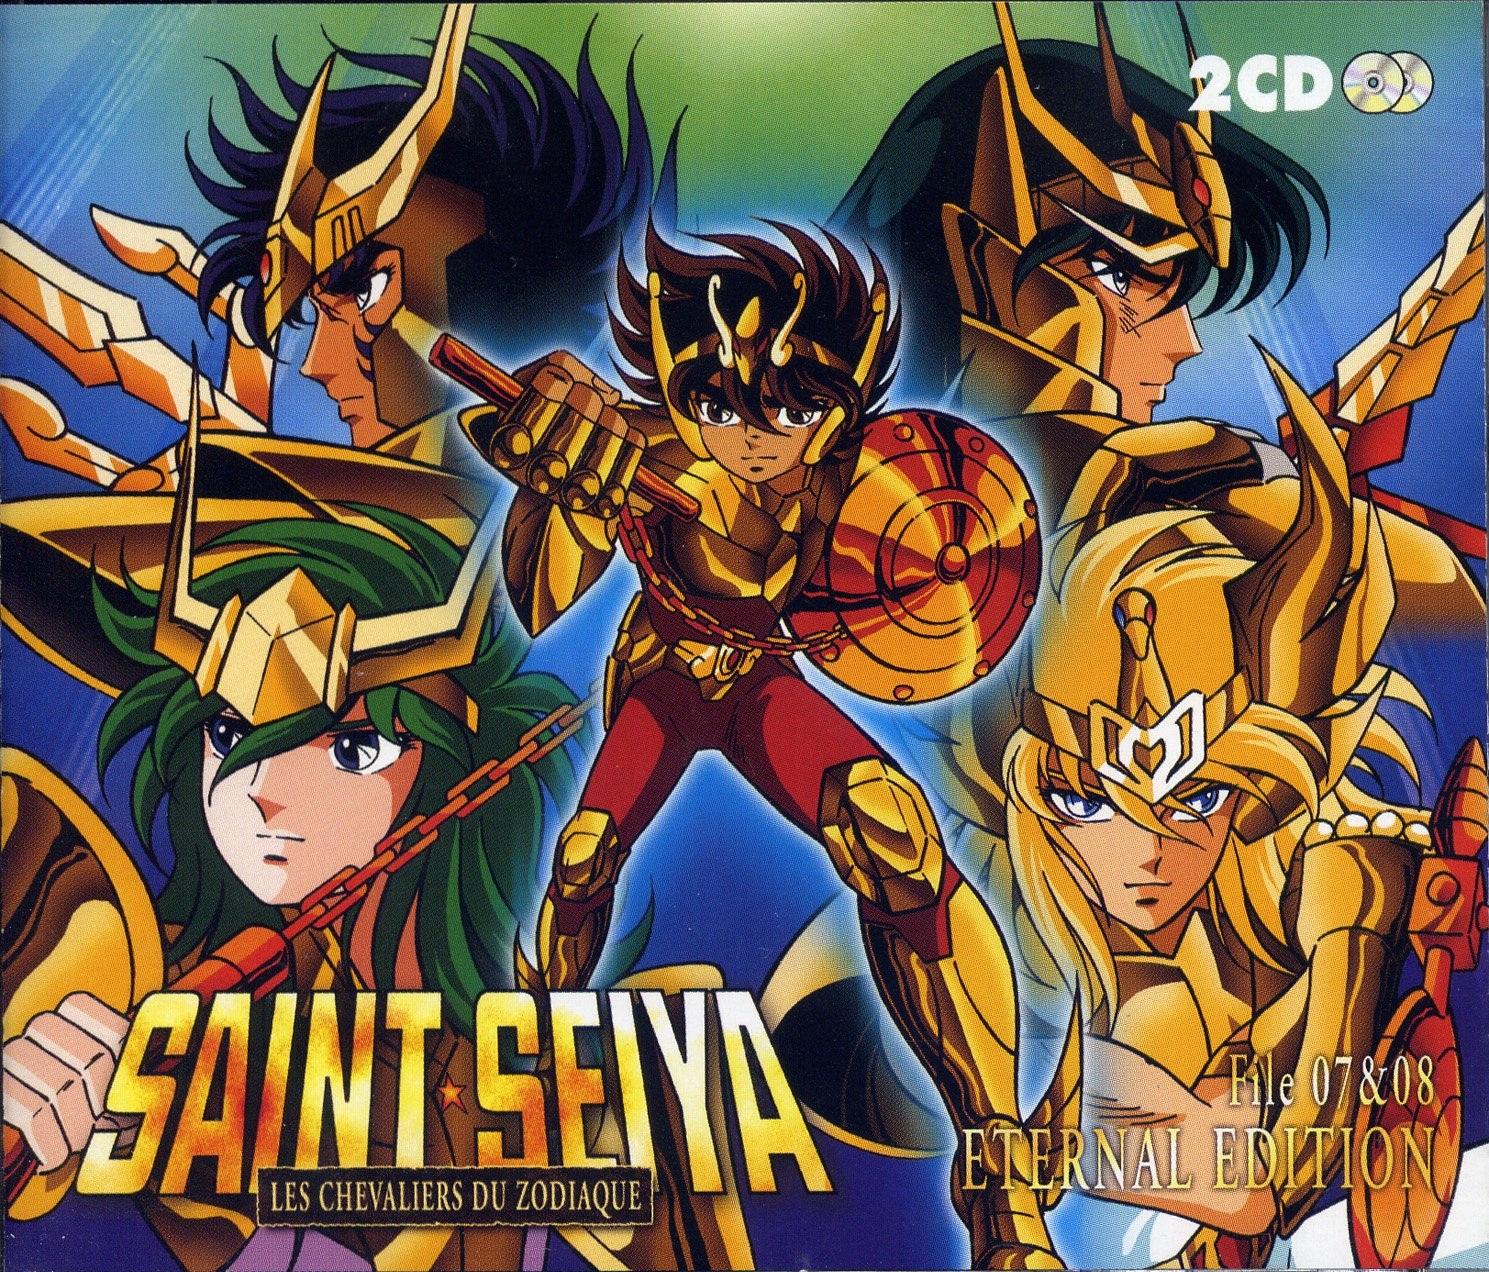 Saint Seiya (Phoenix Ikki, Pegasus Seiya, Cygnus Hyoga